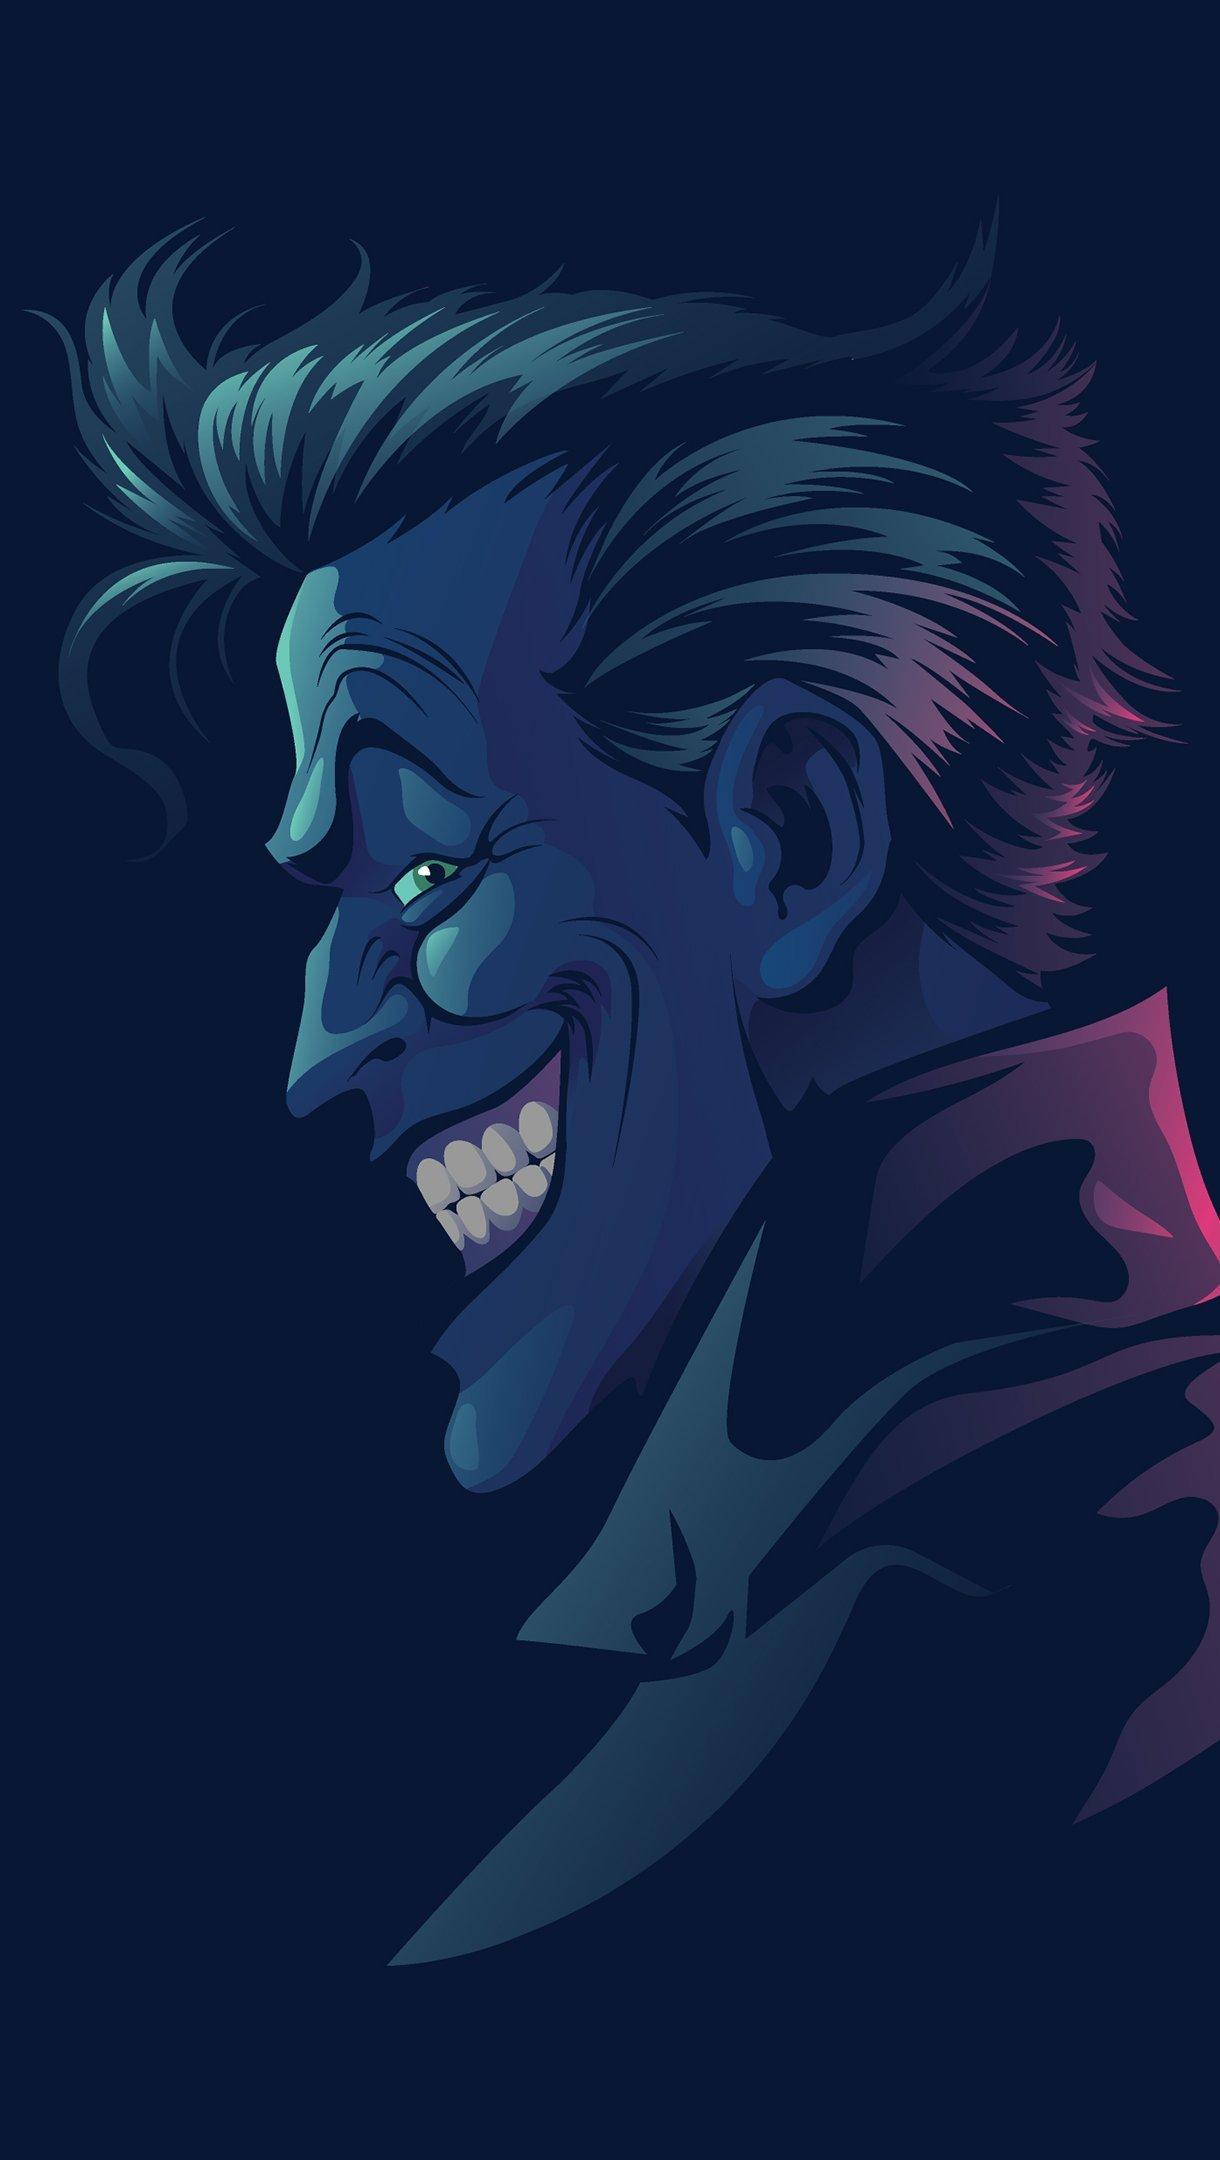 Fondos de pantalla Joker (Guasón) Minimalist Vertical